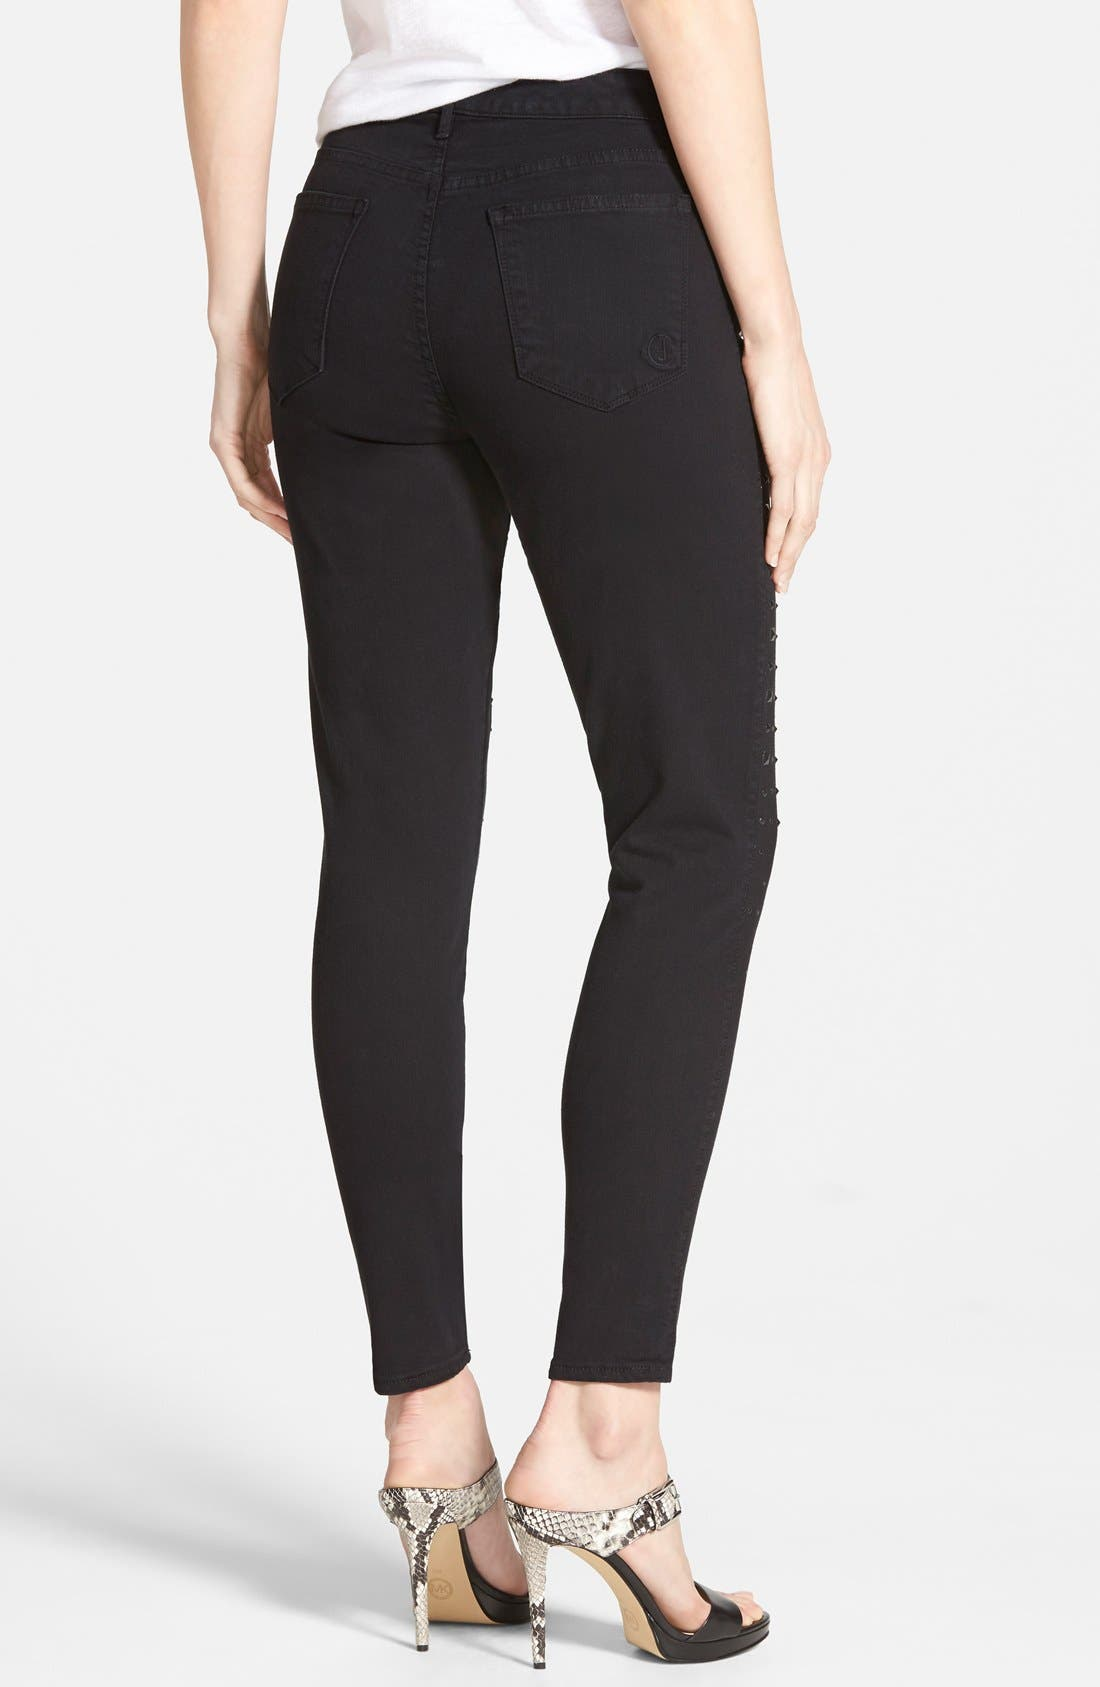 Alternate Image 2  - CJ by Cookie Johnson 'Wisdom' Studded Ankle Skinny Jeans (Black)